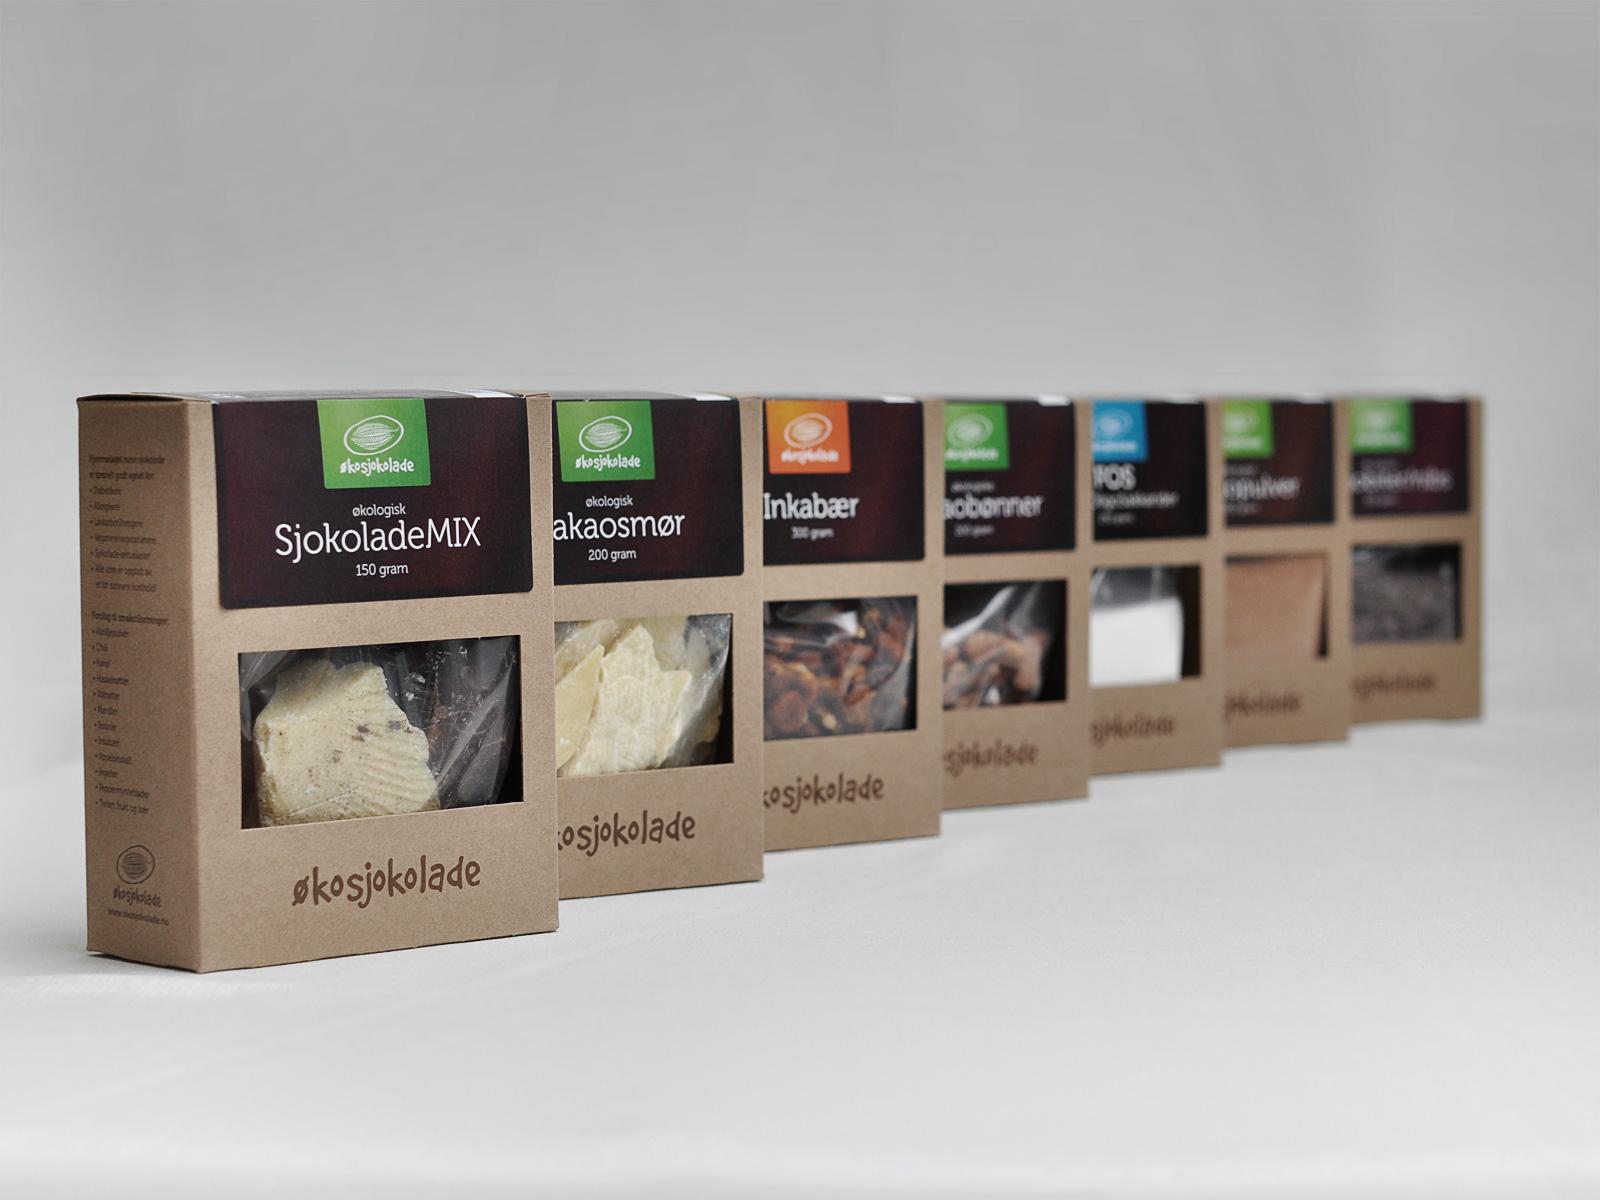 okosjokolade_pre-DSC_2423